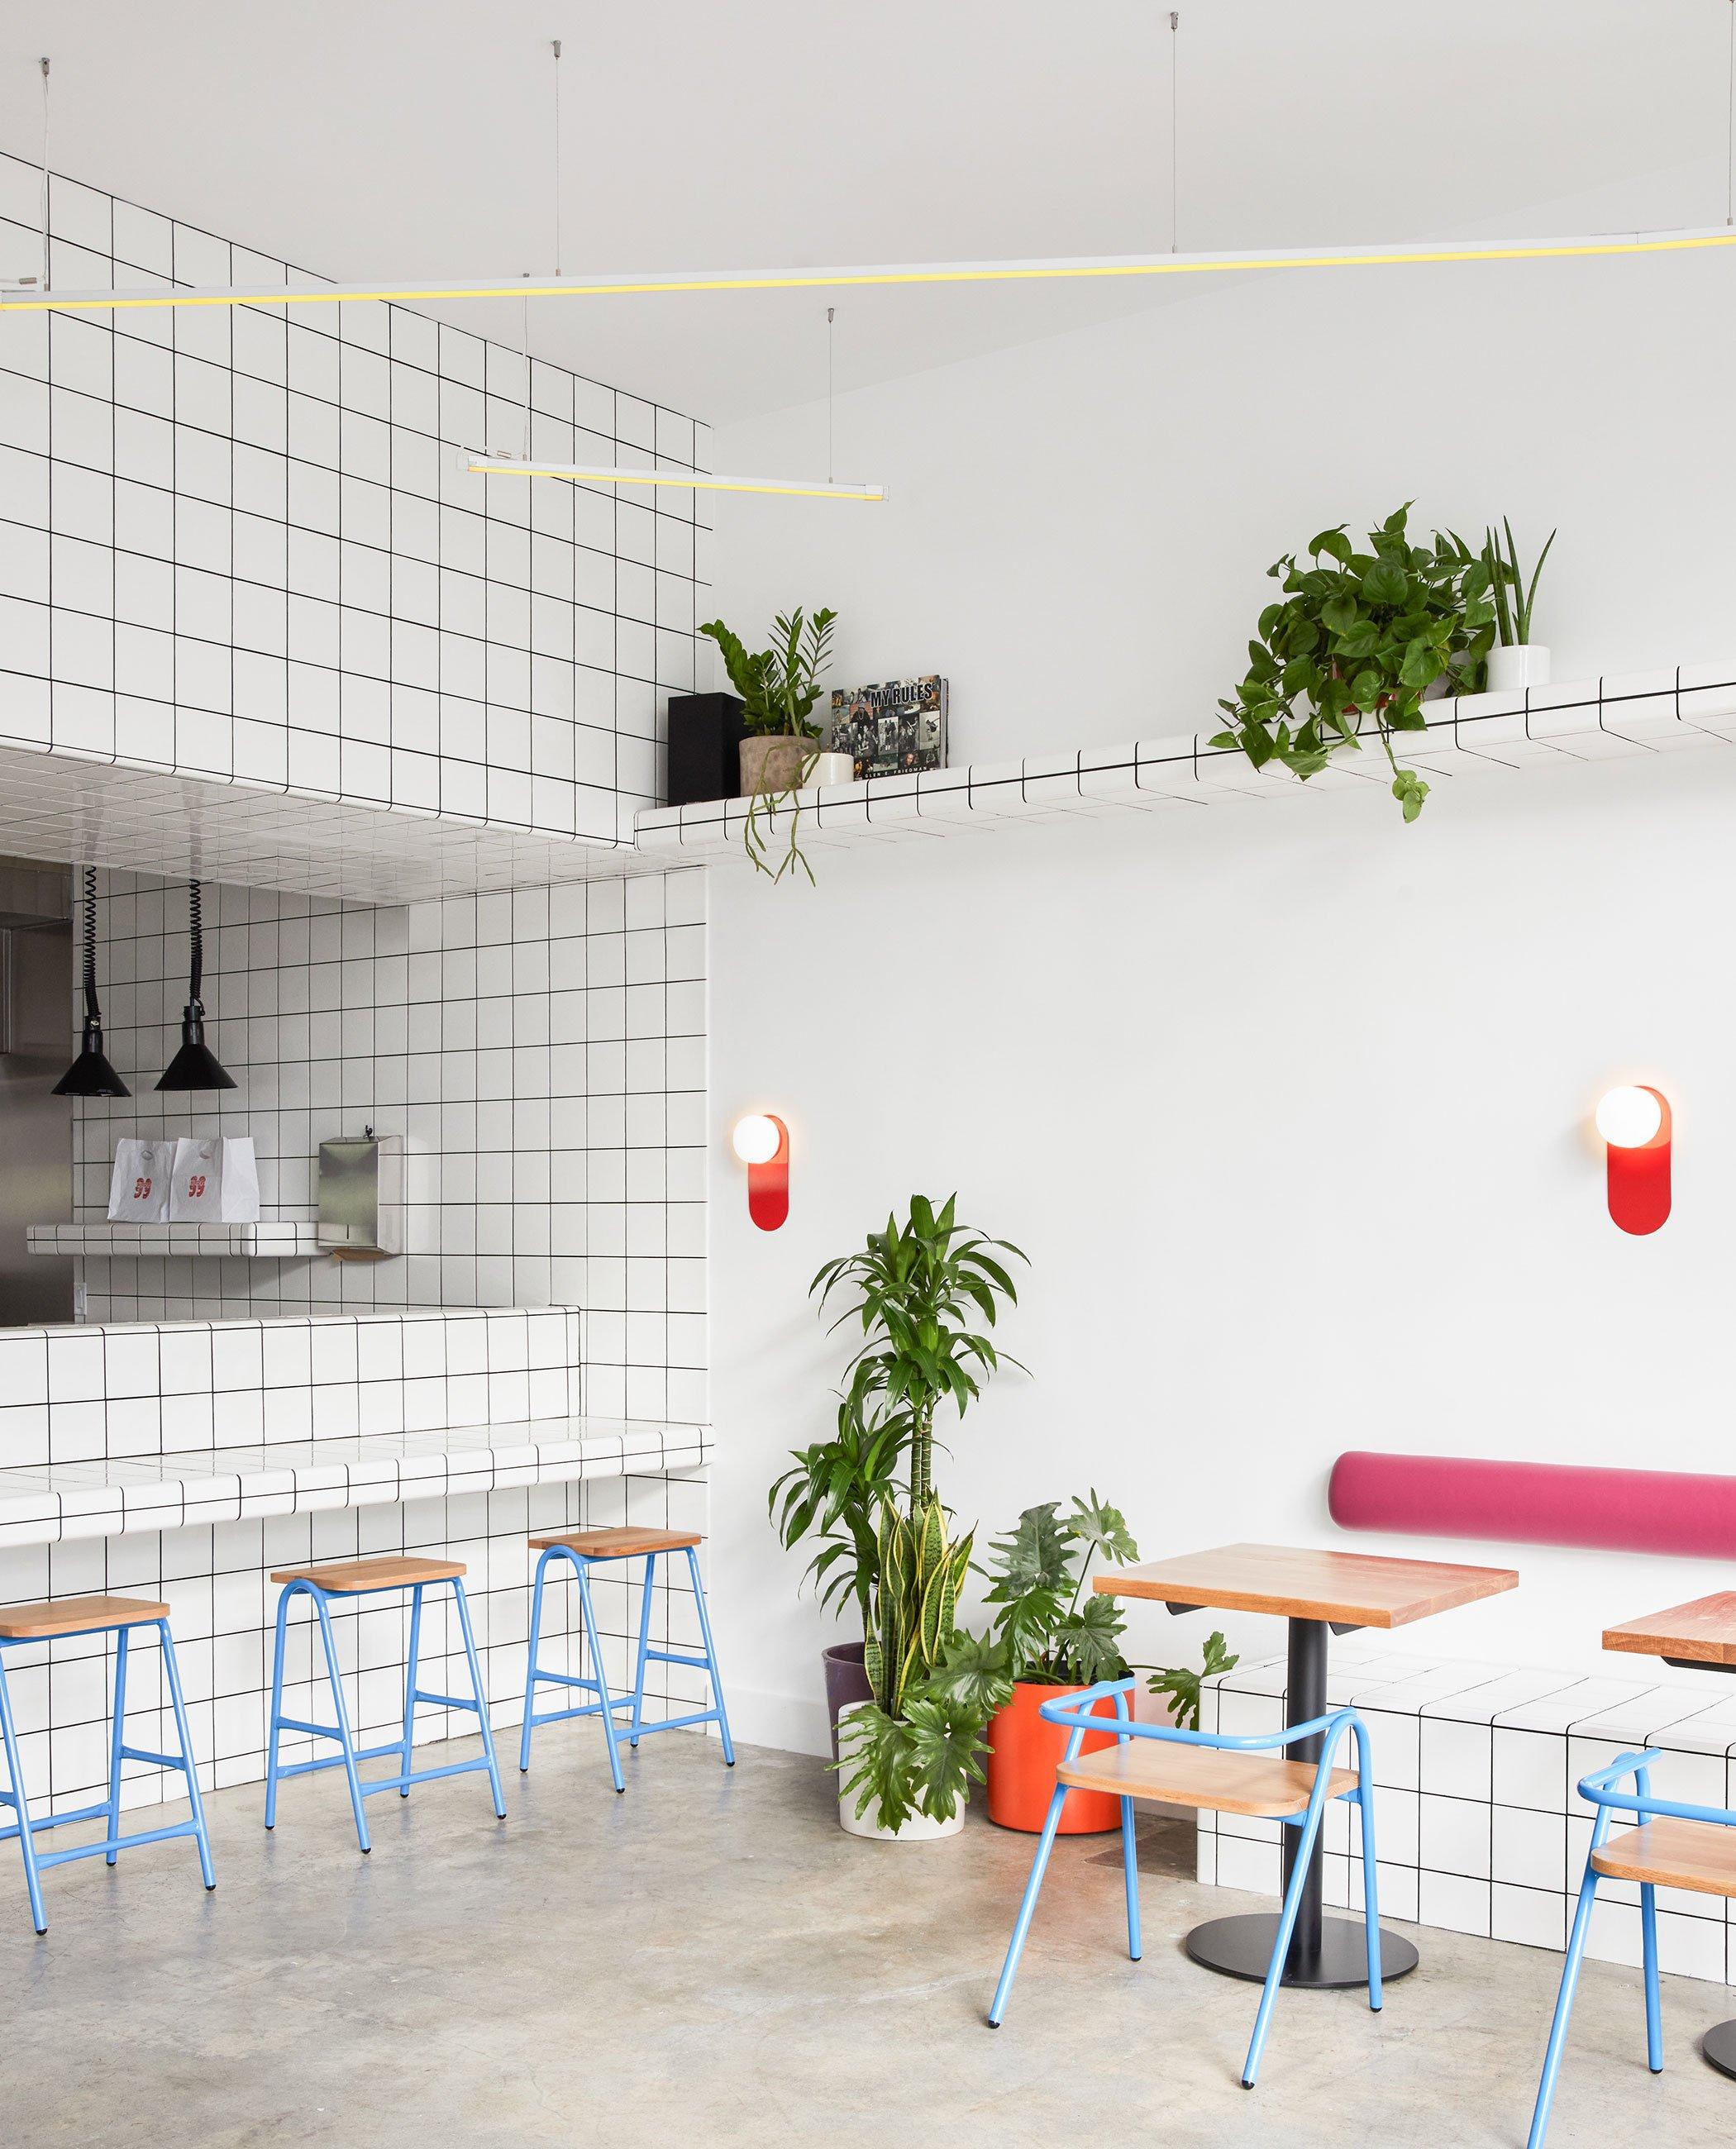 Burgers-99-inspiring-restaurant-design